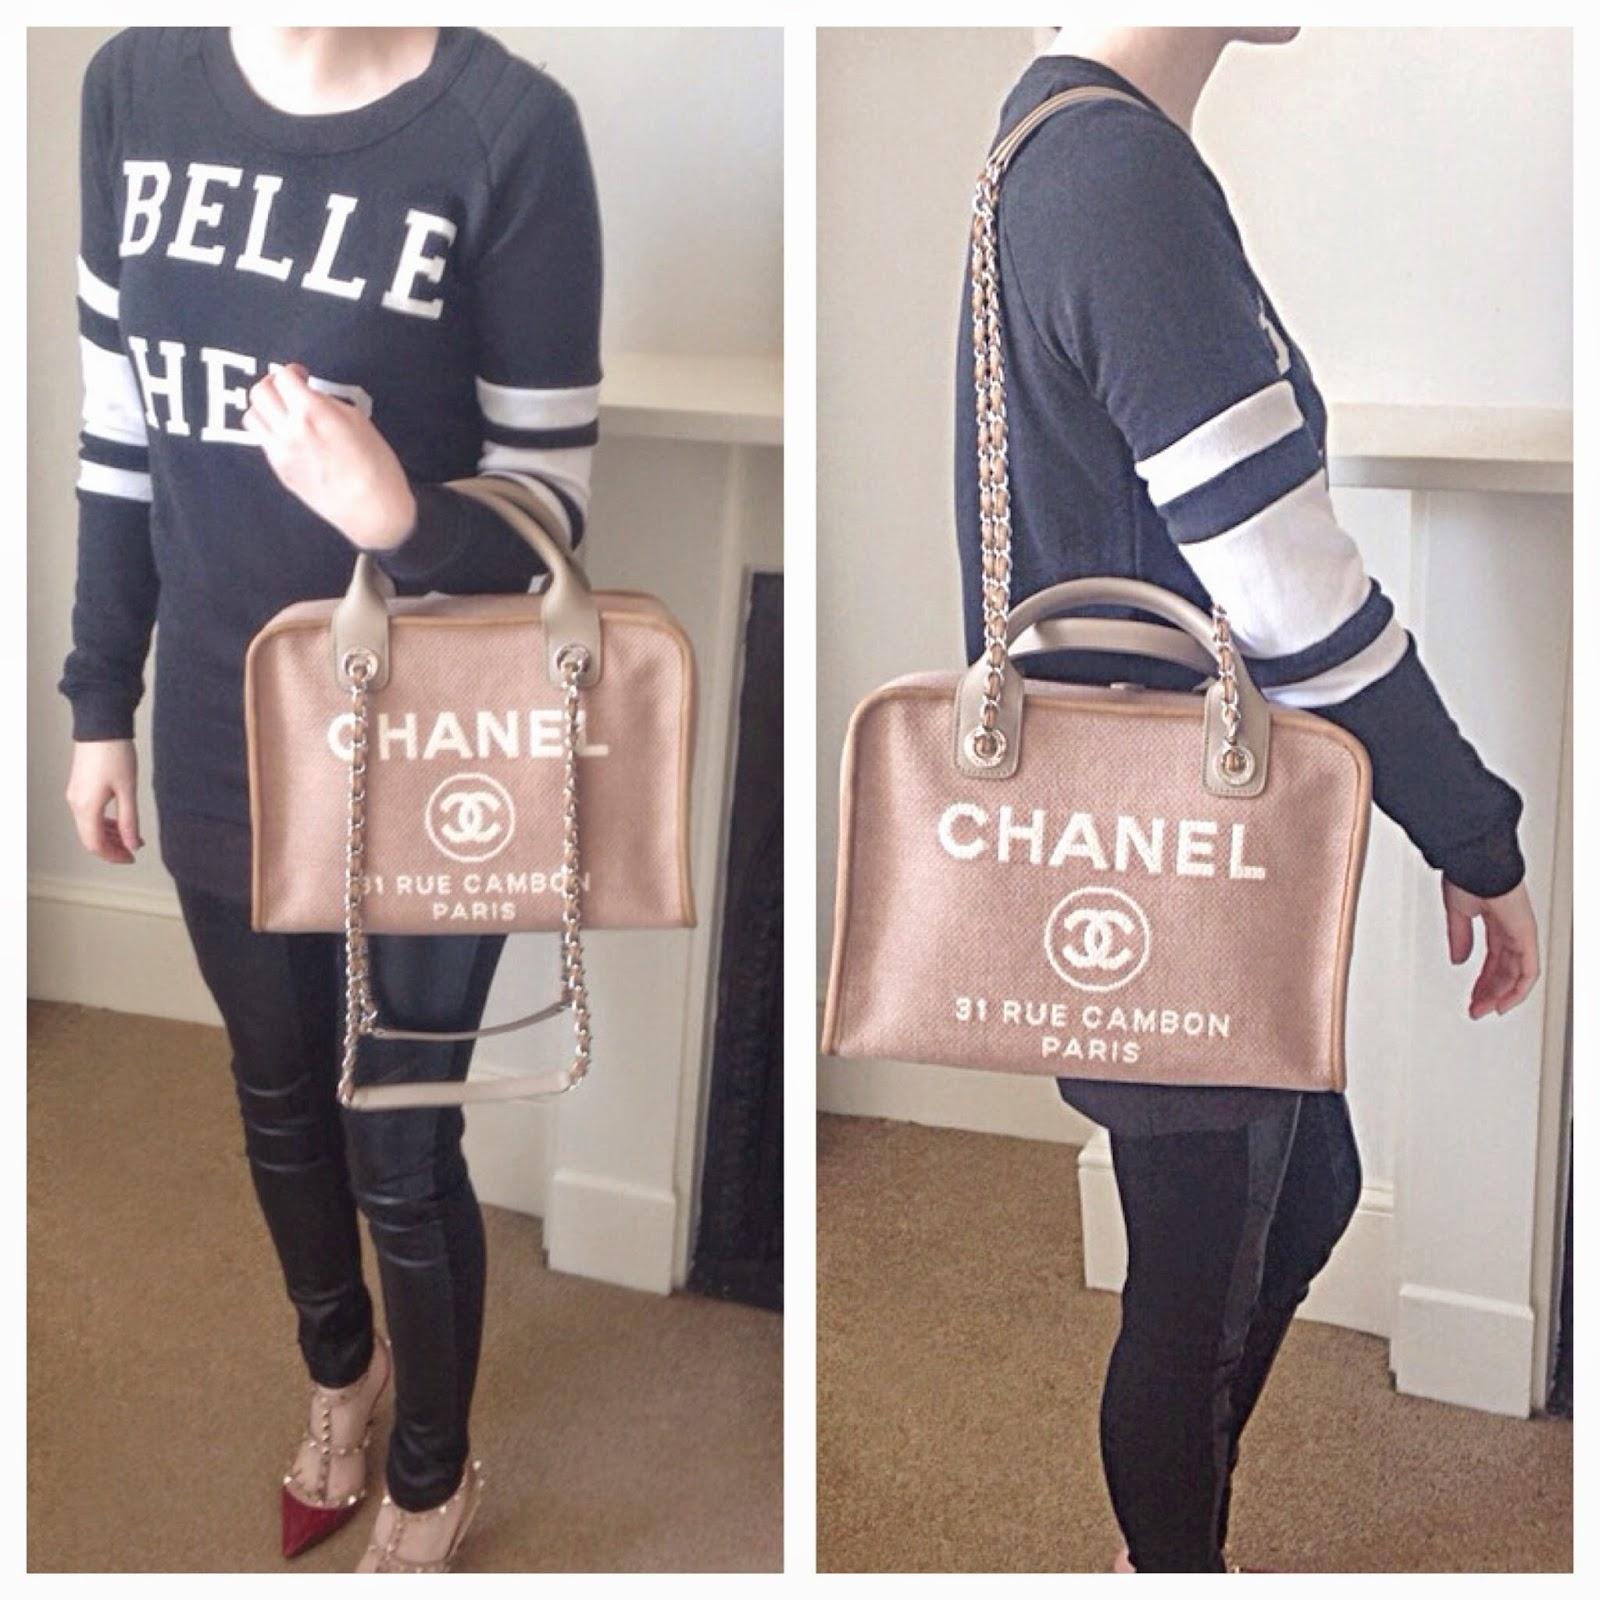 Harga Jual Chanel Deauville Terbaru 2018 Regulator Kompor Gas Dengan Metersniaman Awet Dan Efisien Rent Or Bowling Bag For The Ss15 Season Which Sa Showed Me On Her